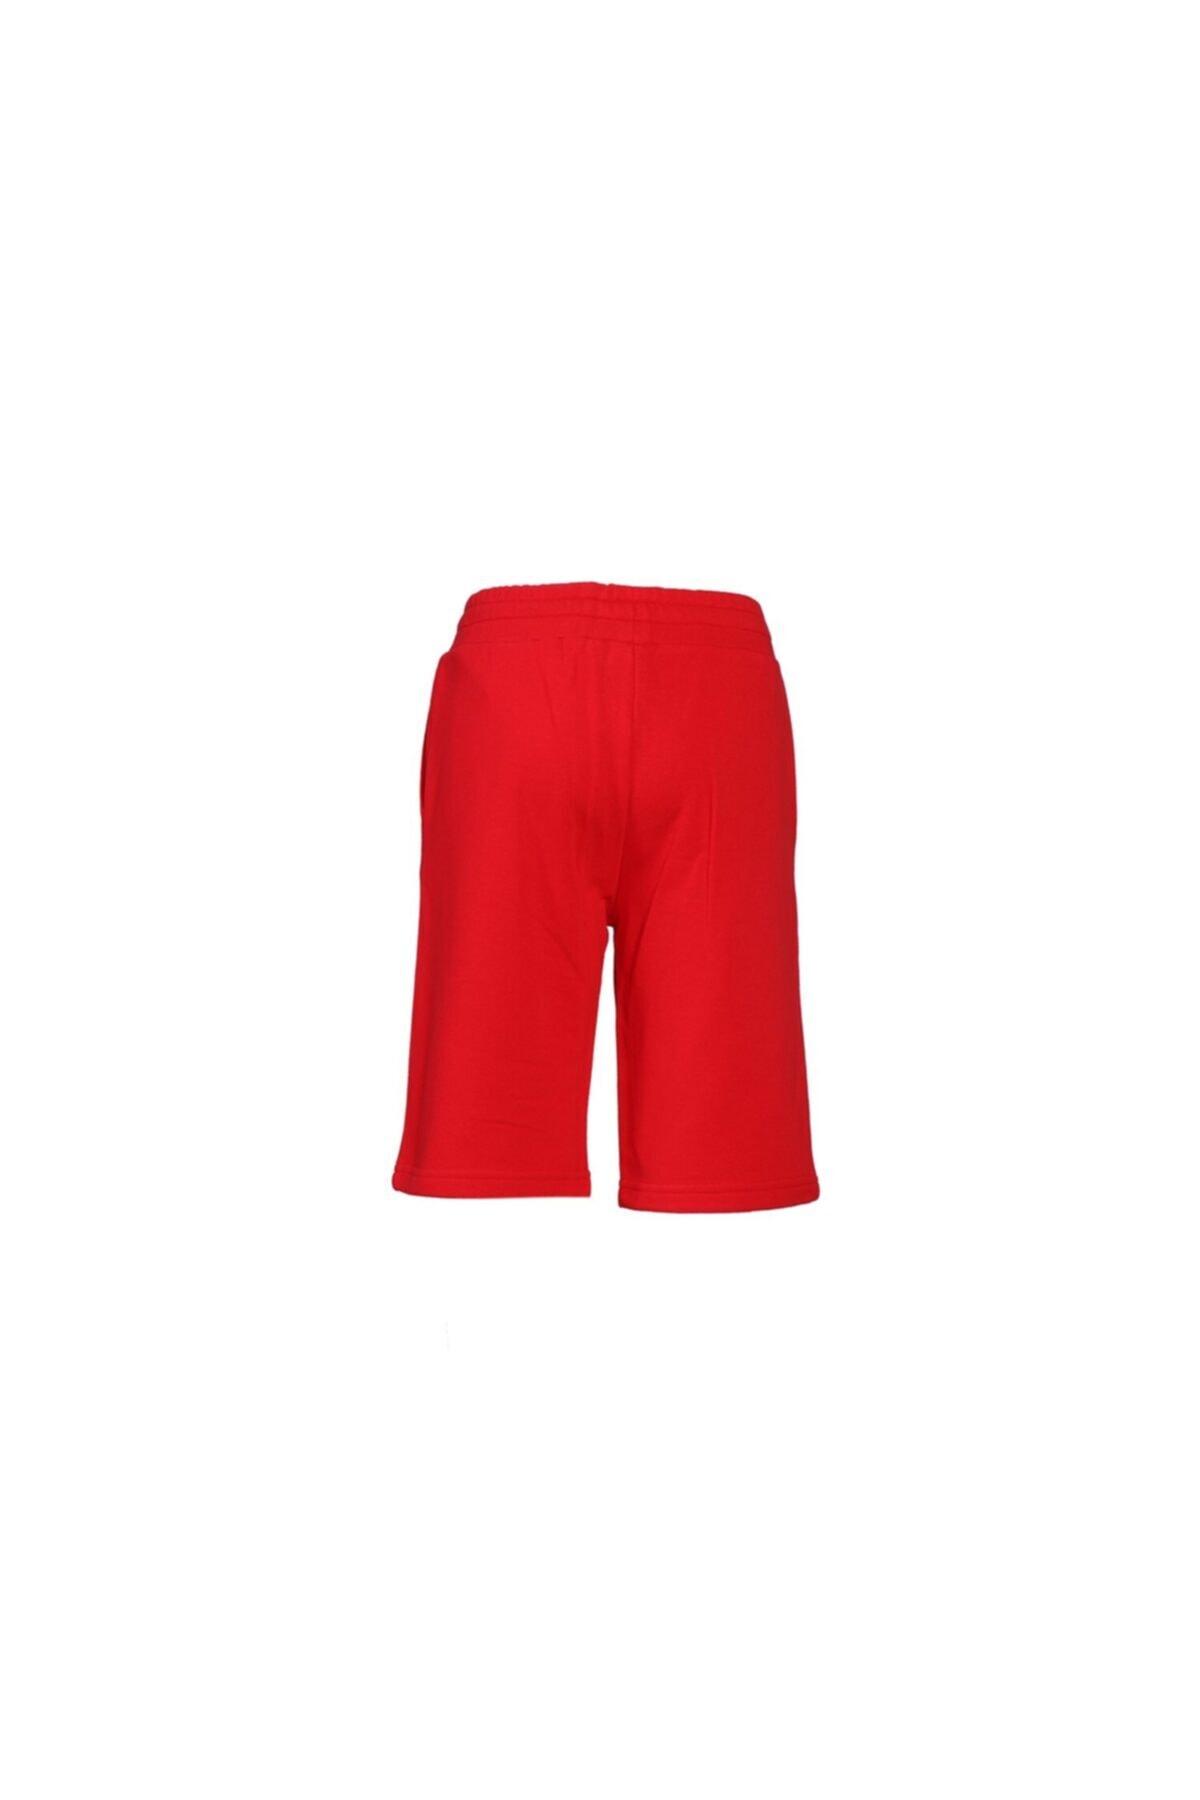 HUMMEL Bosley Çocuk Shorts 2